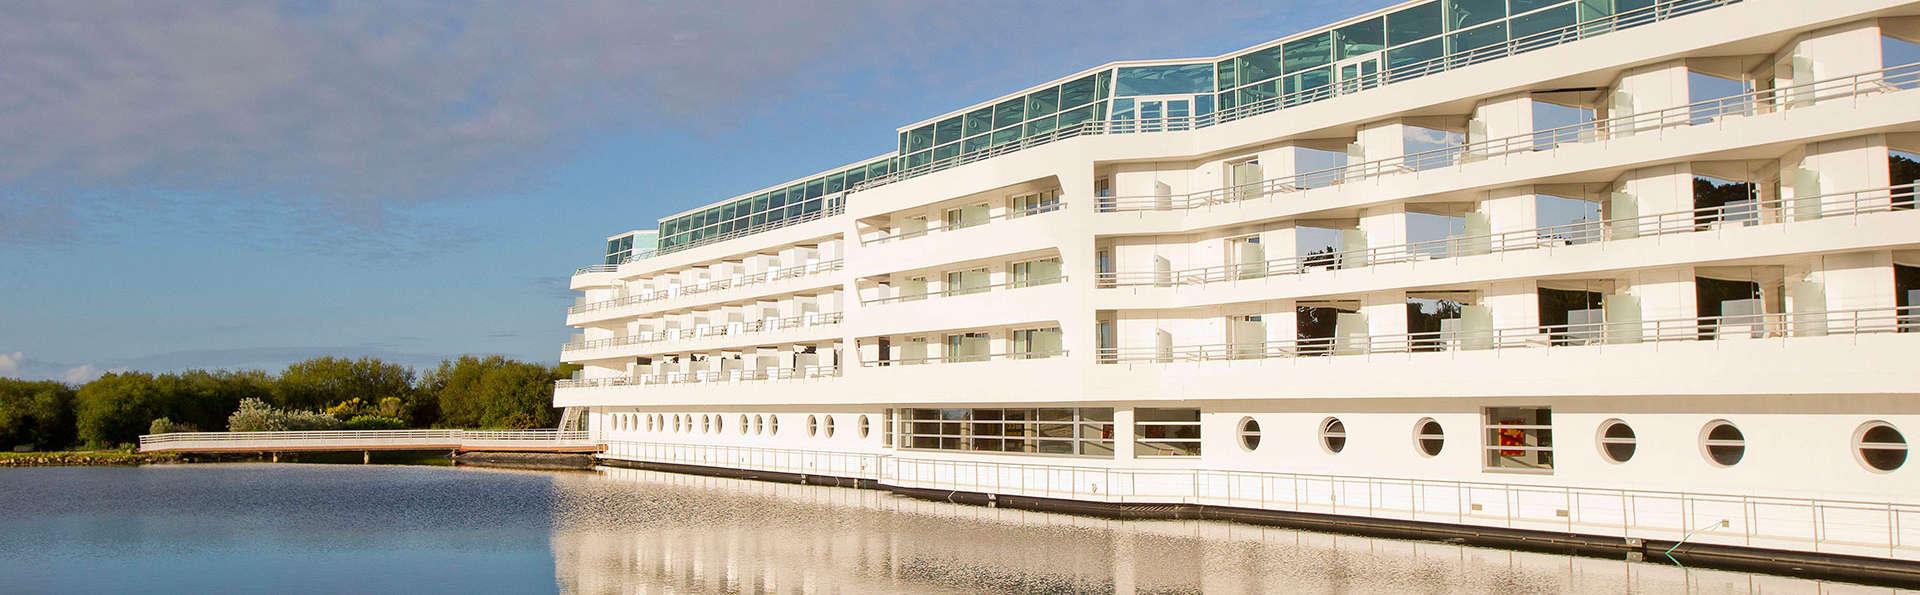 Miramar La Cigale - Hôtel Thalasso & Spa et sa Résidence  - edit_front2.jpg